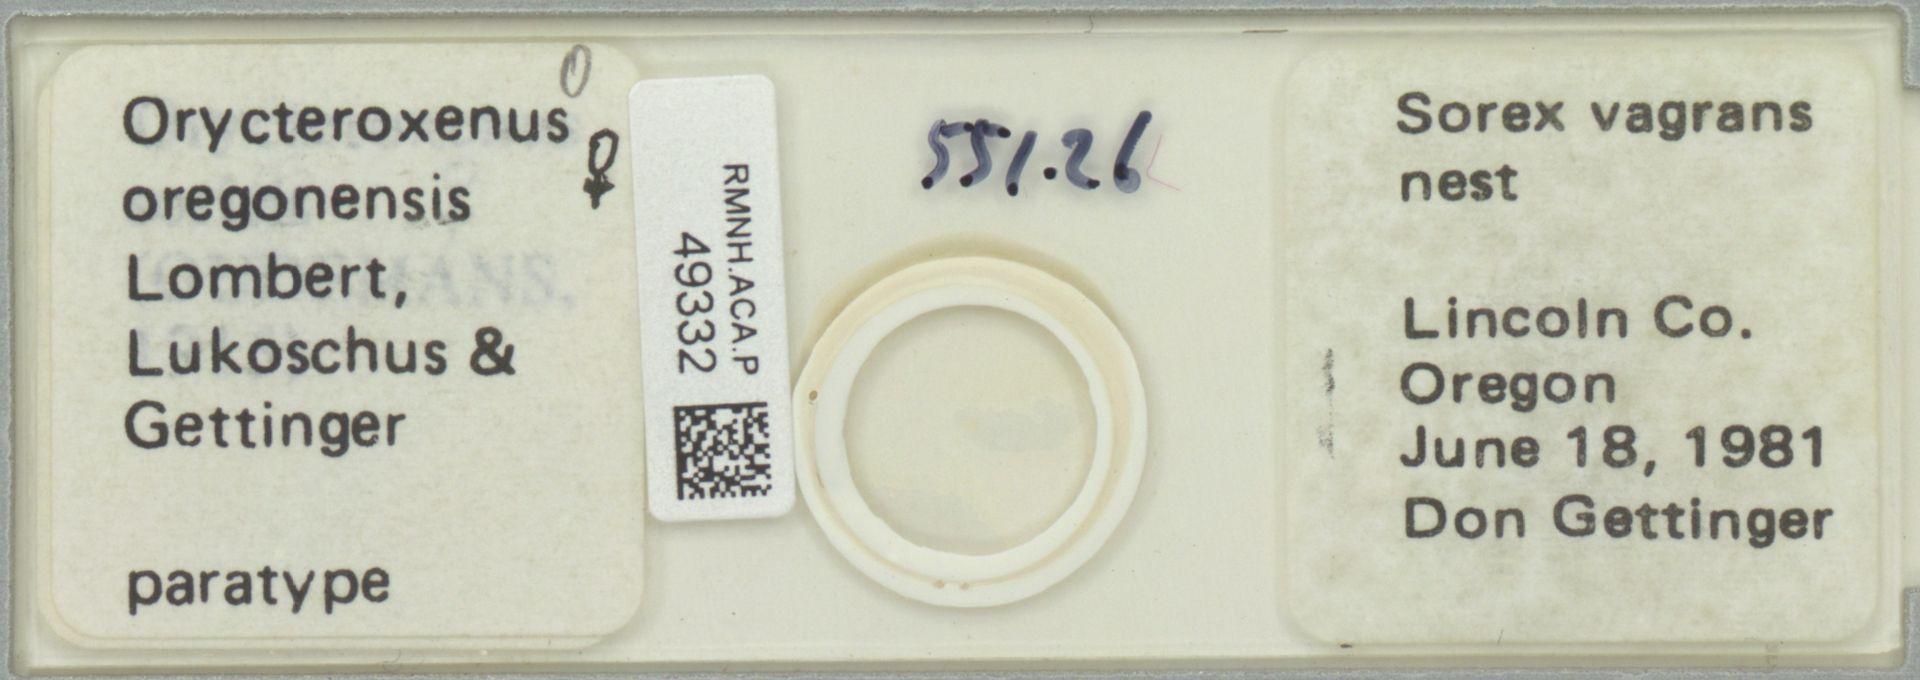 RMNH.ACA.P.49332 | Orycteroxenus oregonensis Lombert, Lukoschus & Gettinger